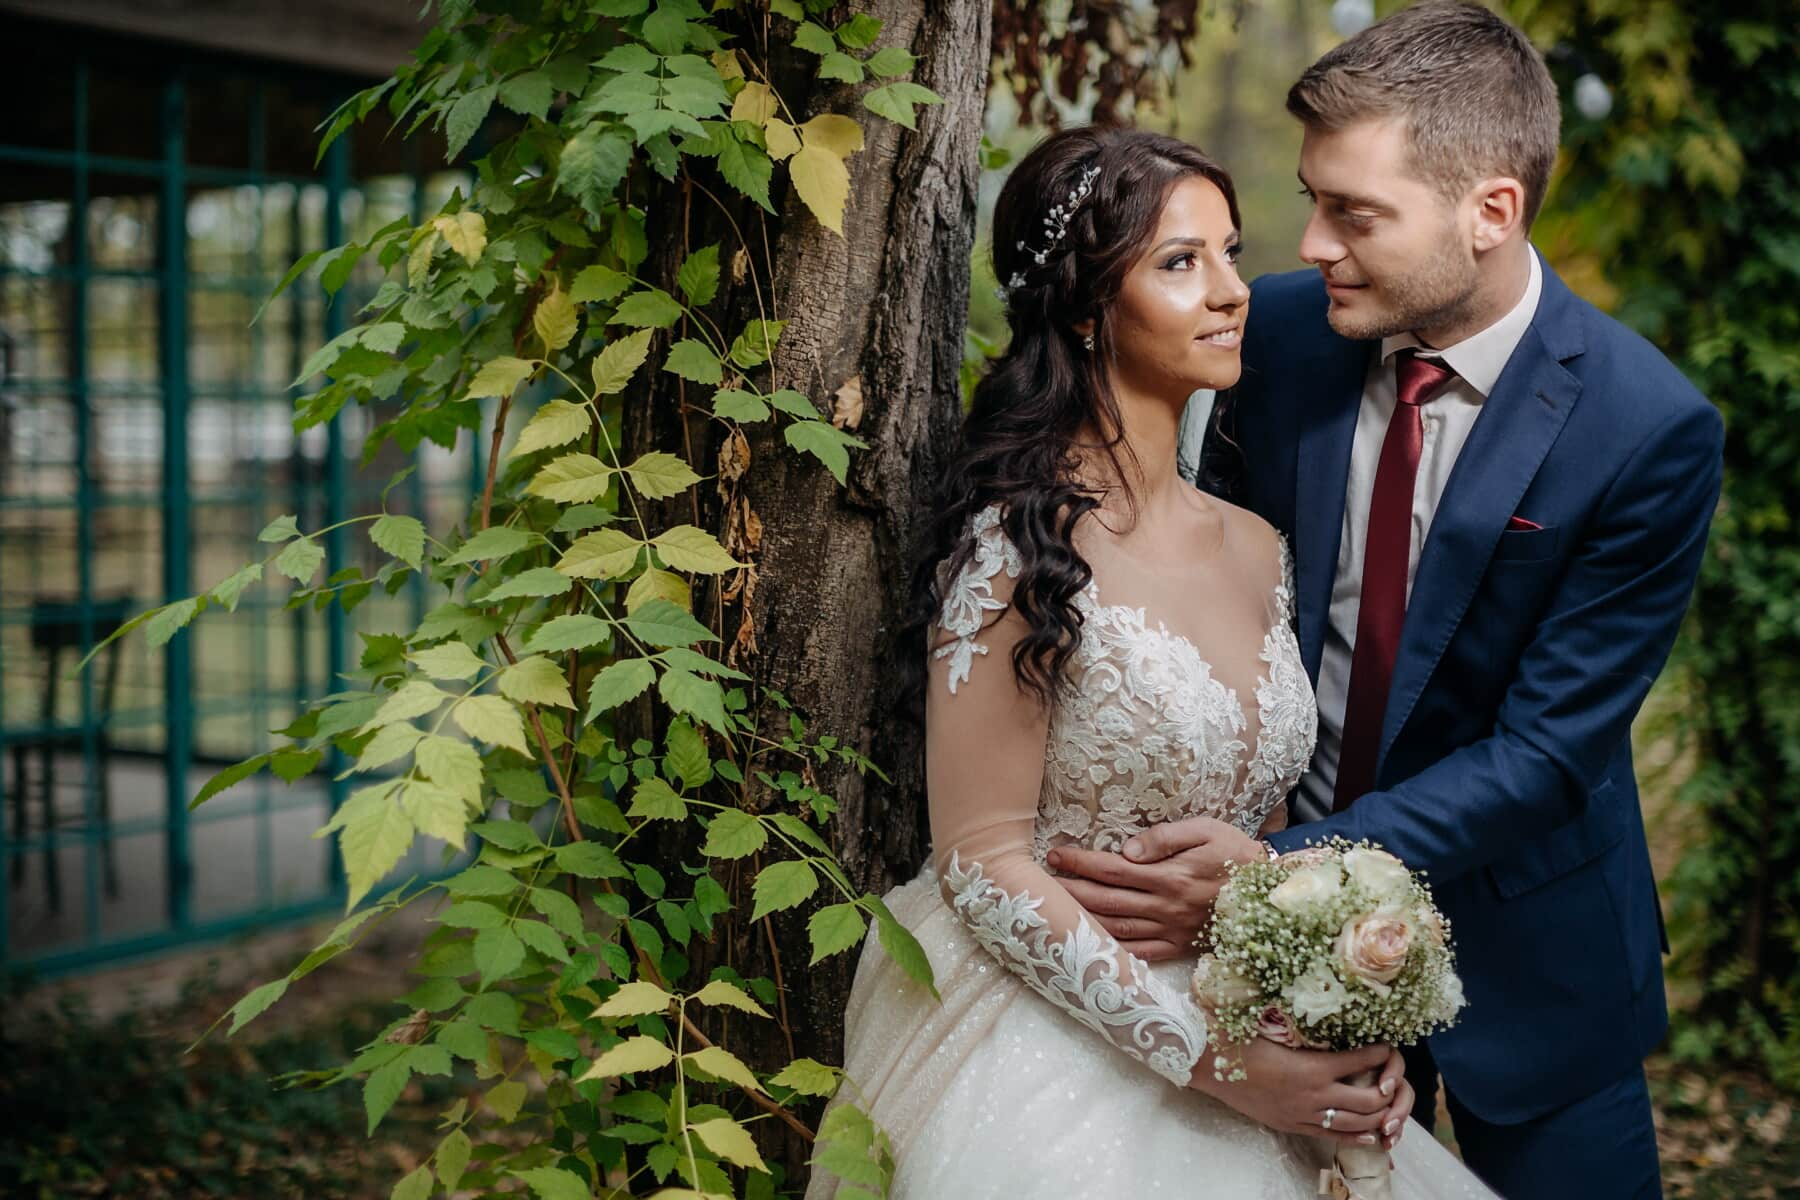 emotion, affection, tenderness, bride, groom, portrait, side view, dress, married, bouquet